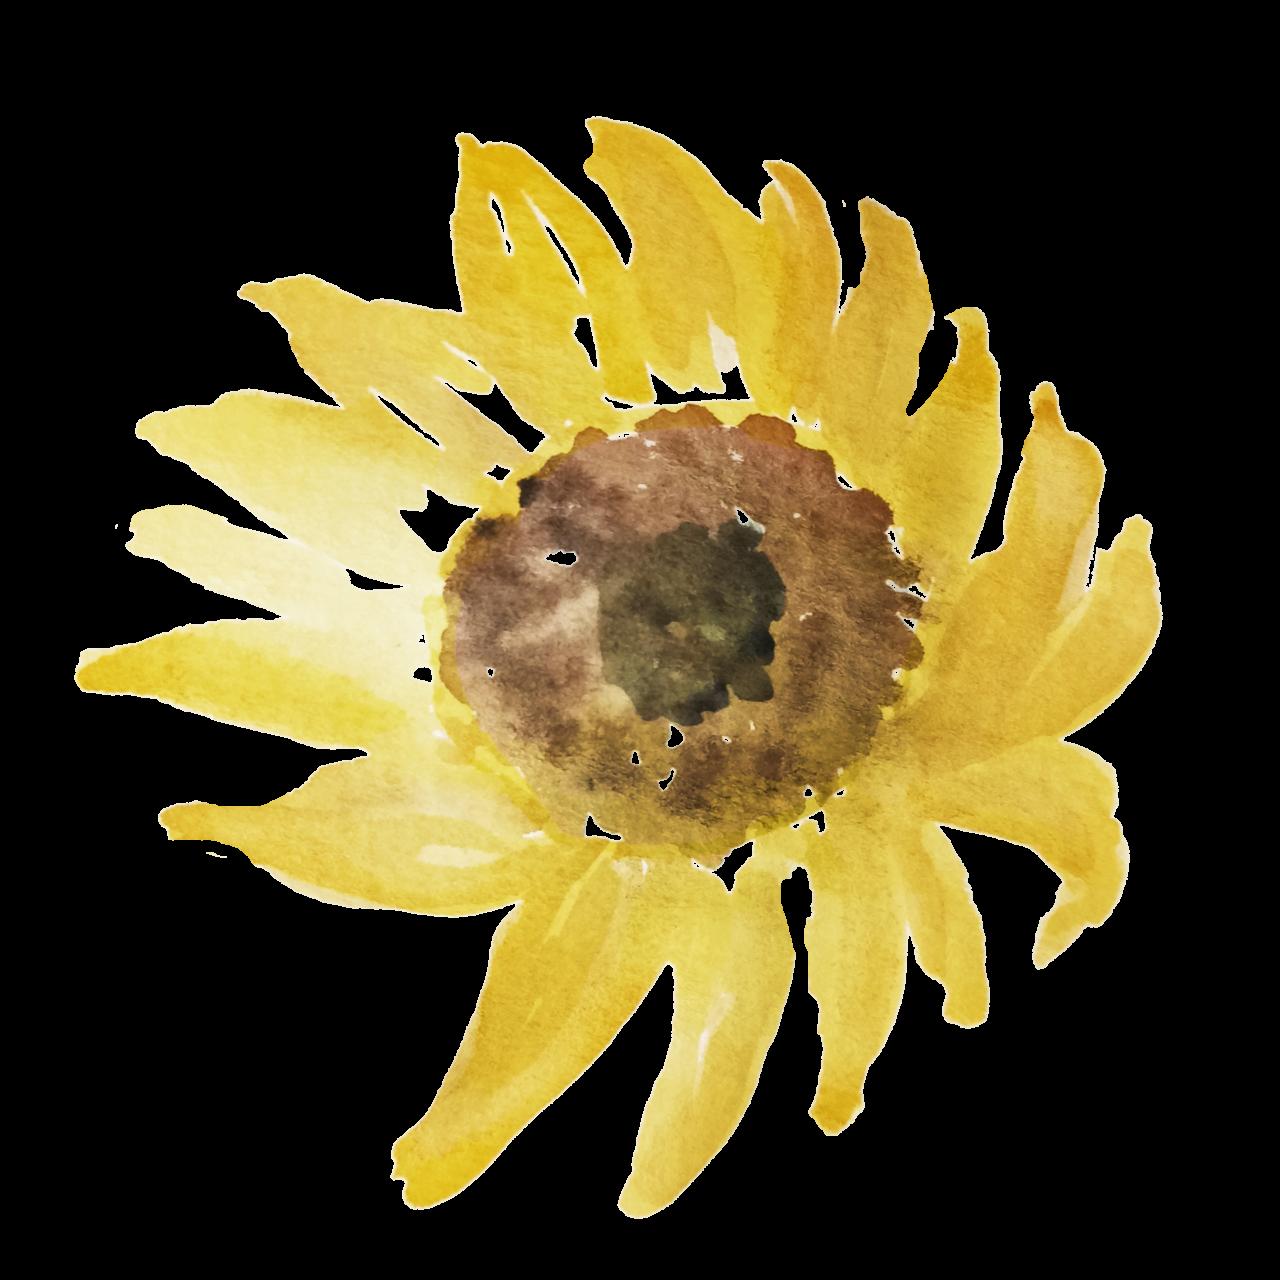 https://marigiova.gr/wp-content/uploads/2021/08/IanMikraz-Watercolor-Sunflower-01-1280x1280.png